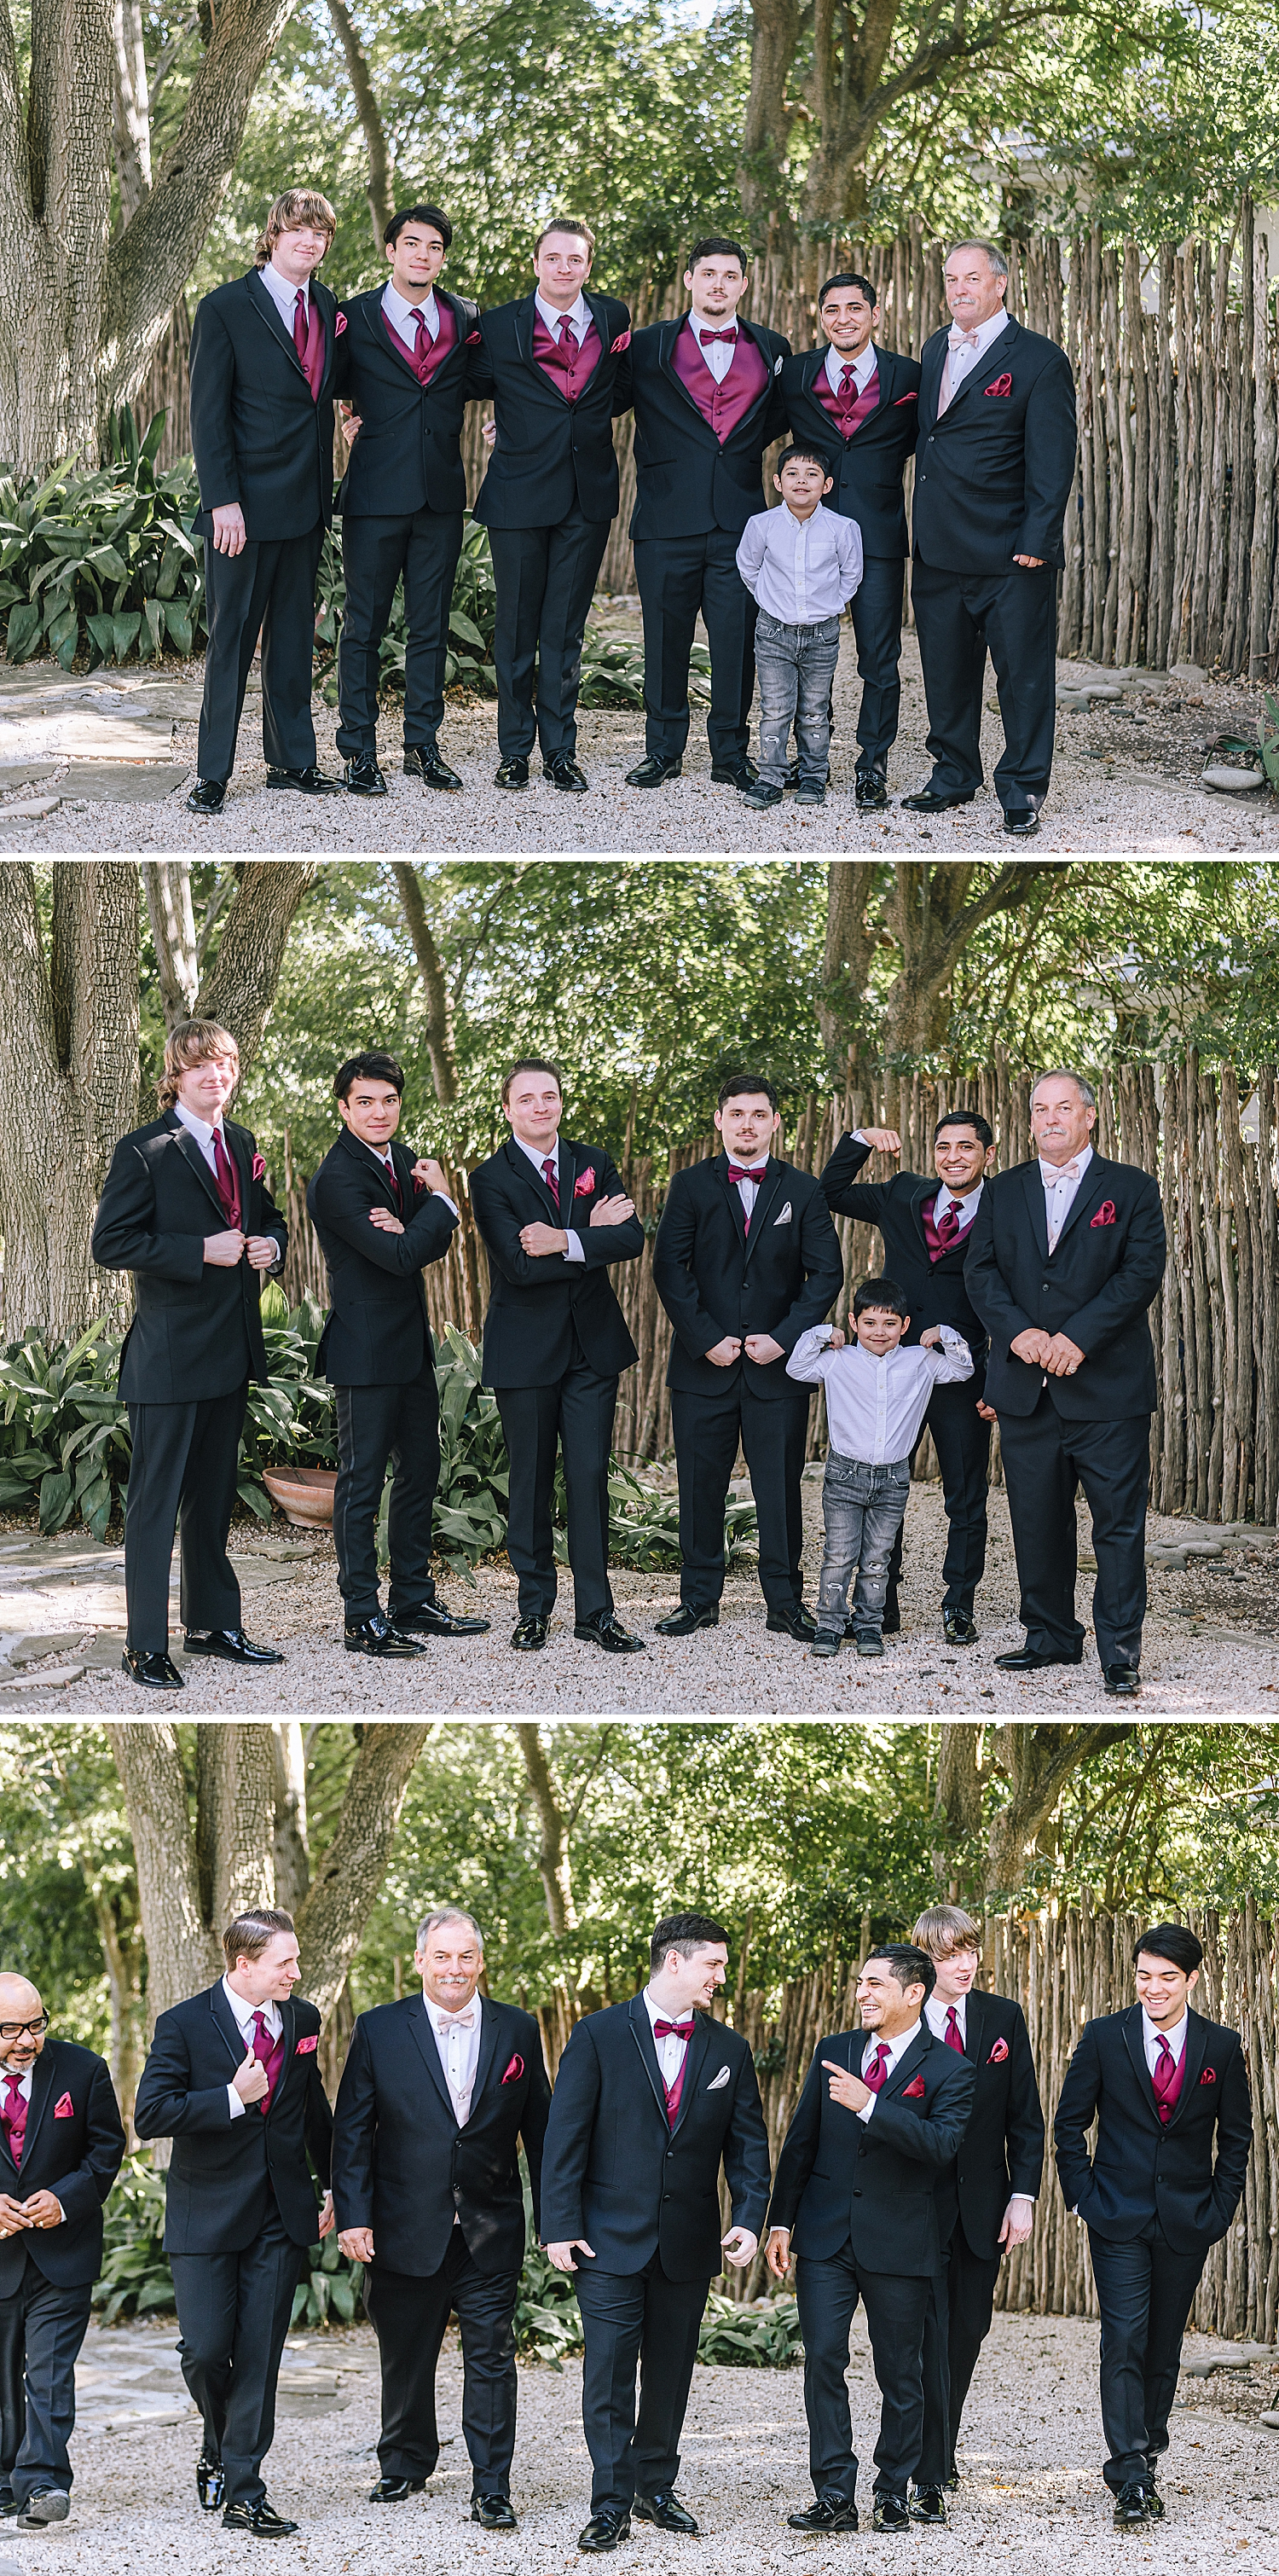 New-Braunfels-Wedding-Photographer-Gruene-Estate-Carly-Barton-Photography_0026.jpg